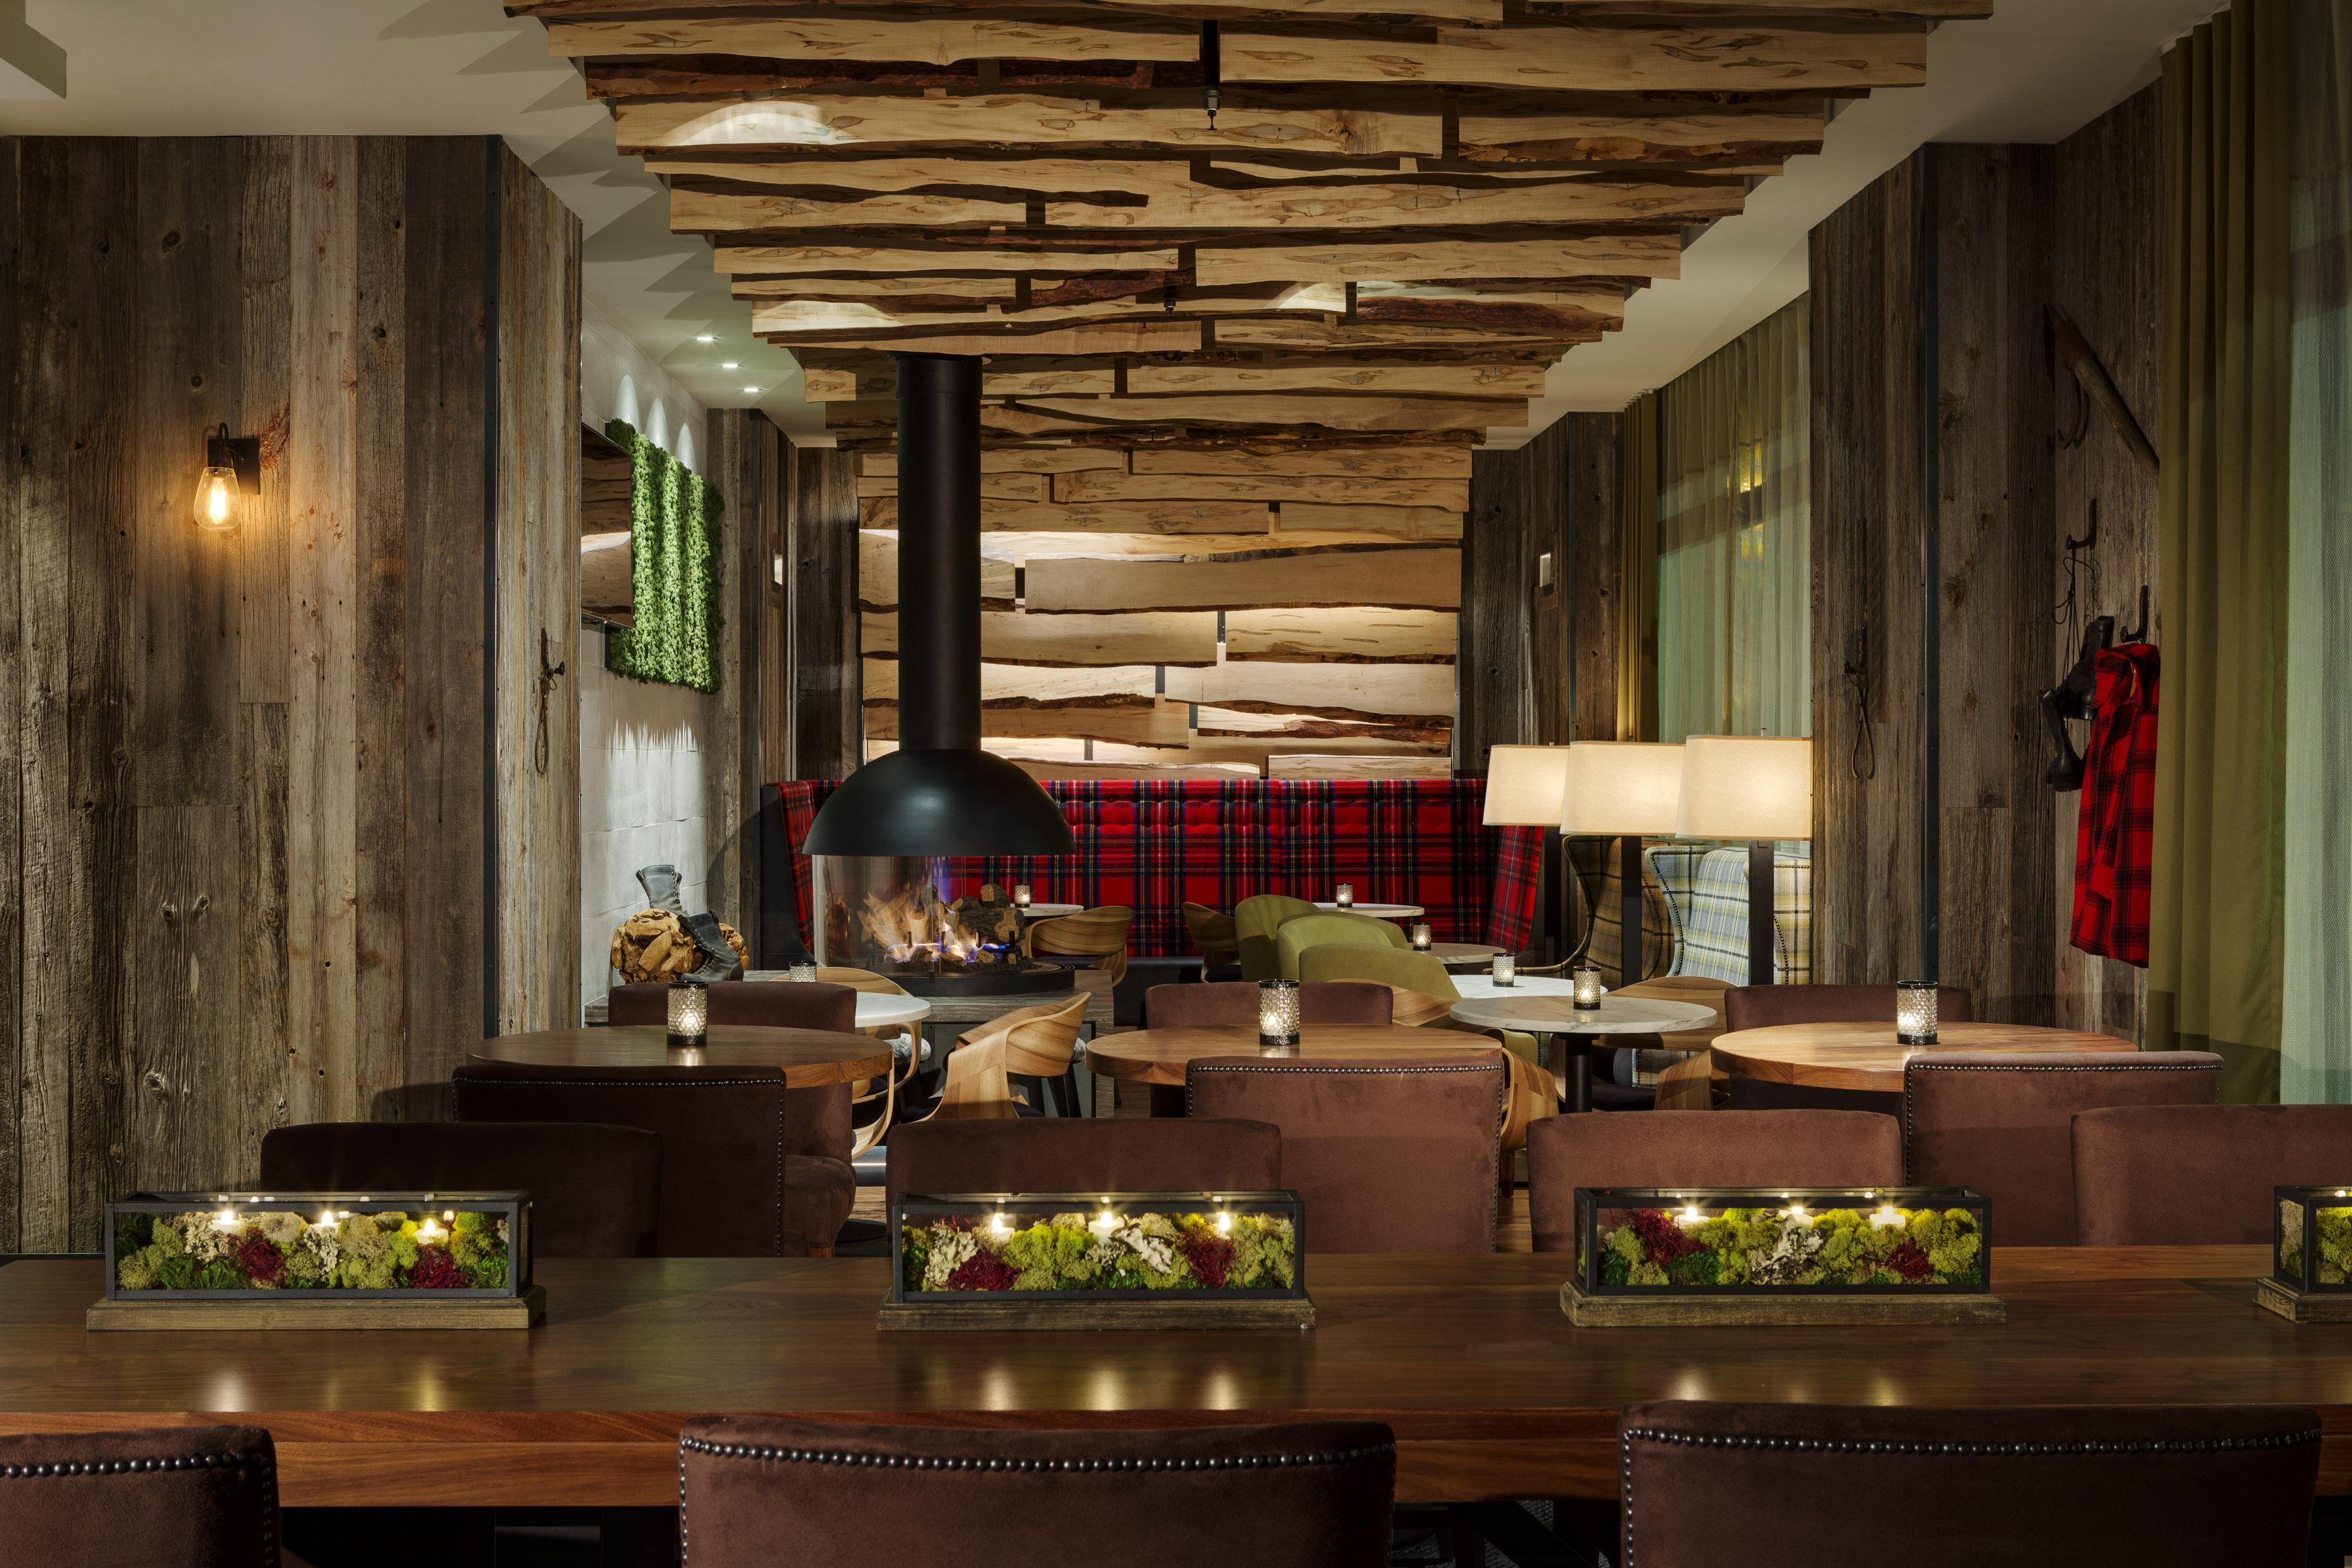 menus u2014 timber kitchen and bar